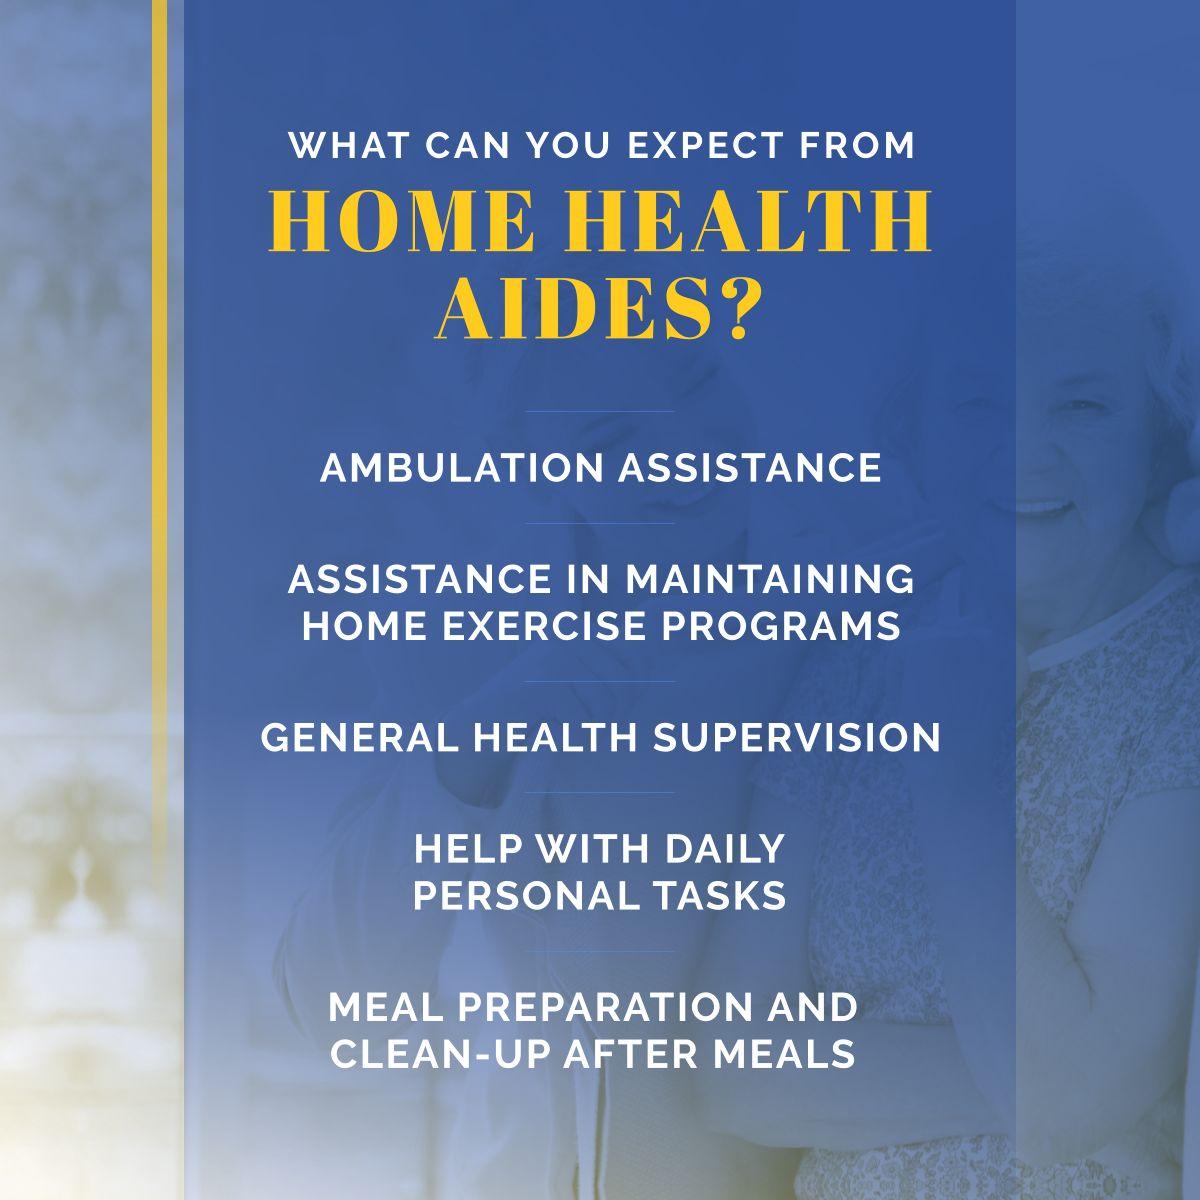 Home Home health aide, Home exercise program, Home health